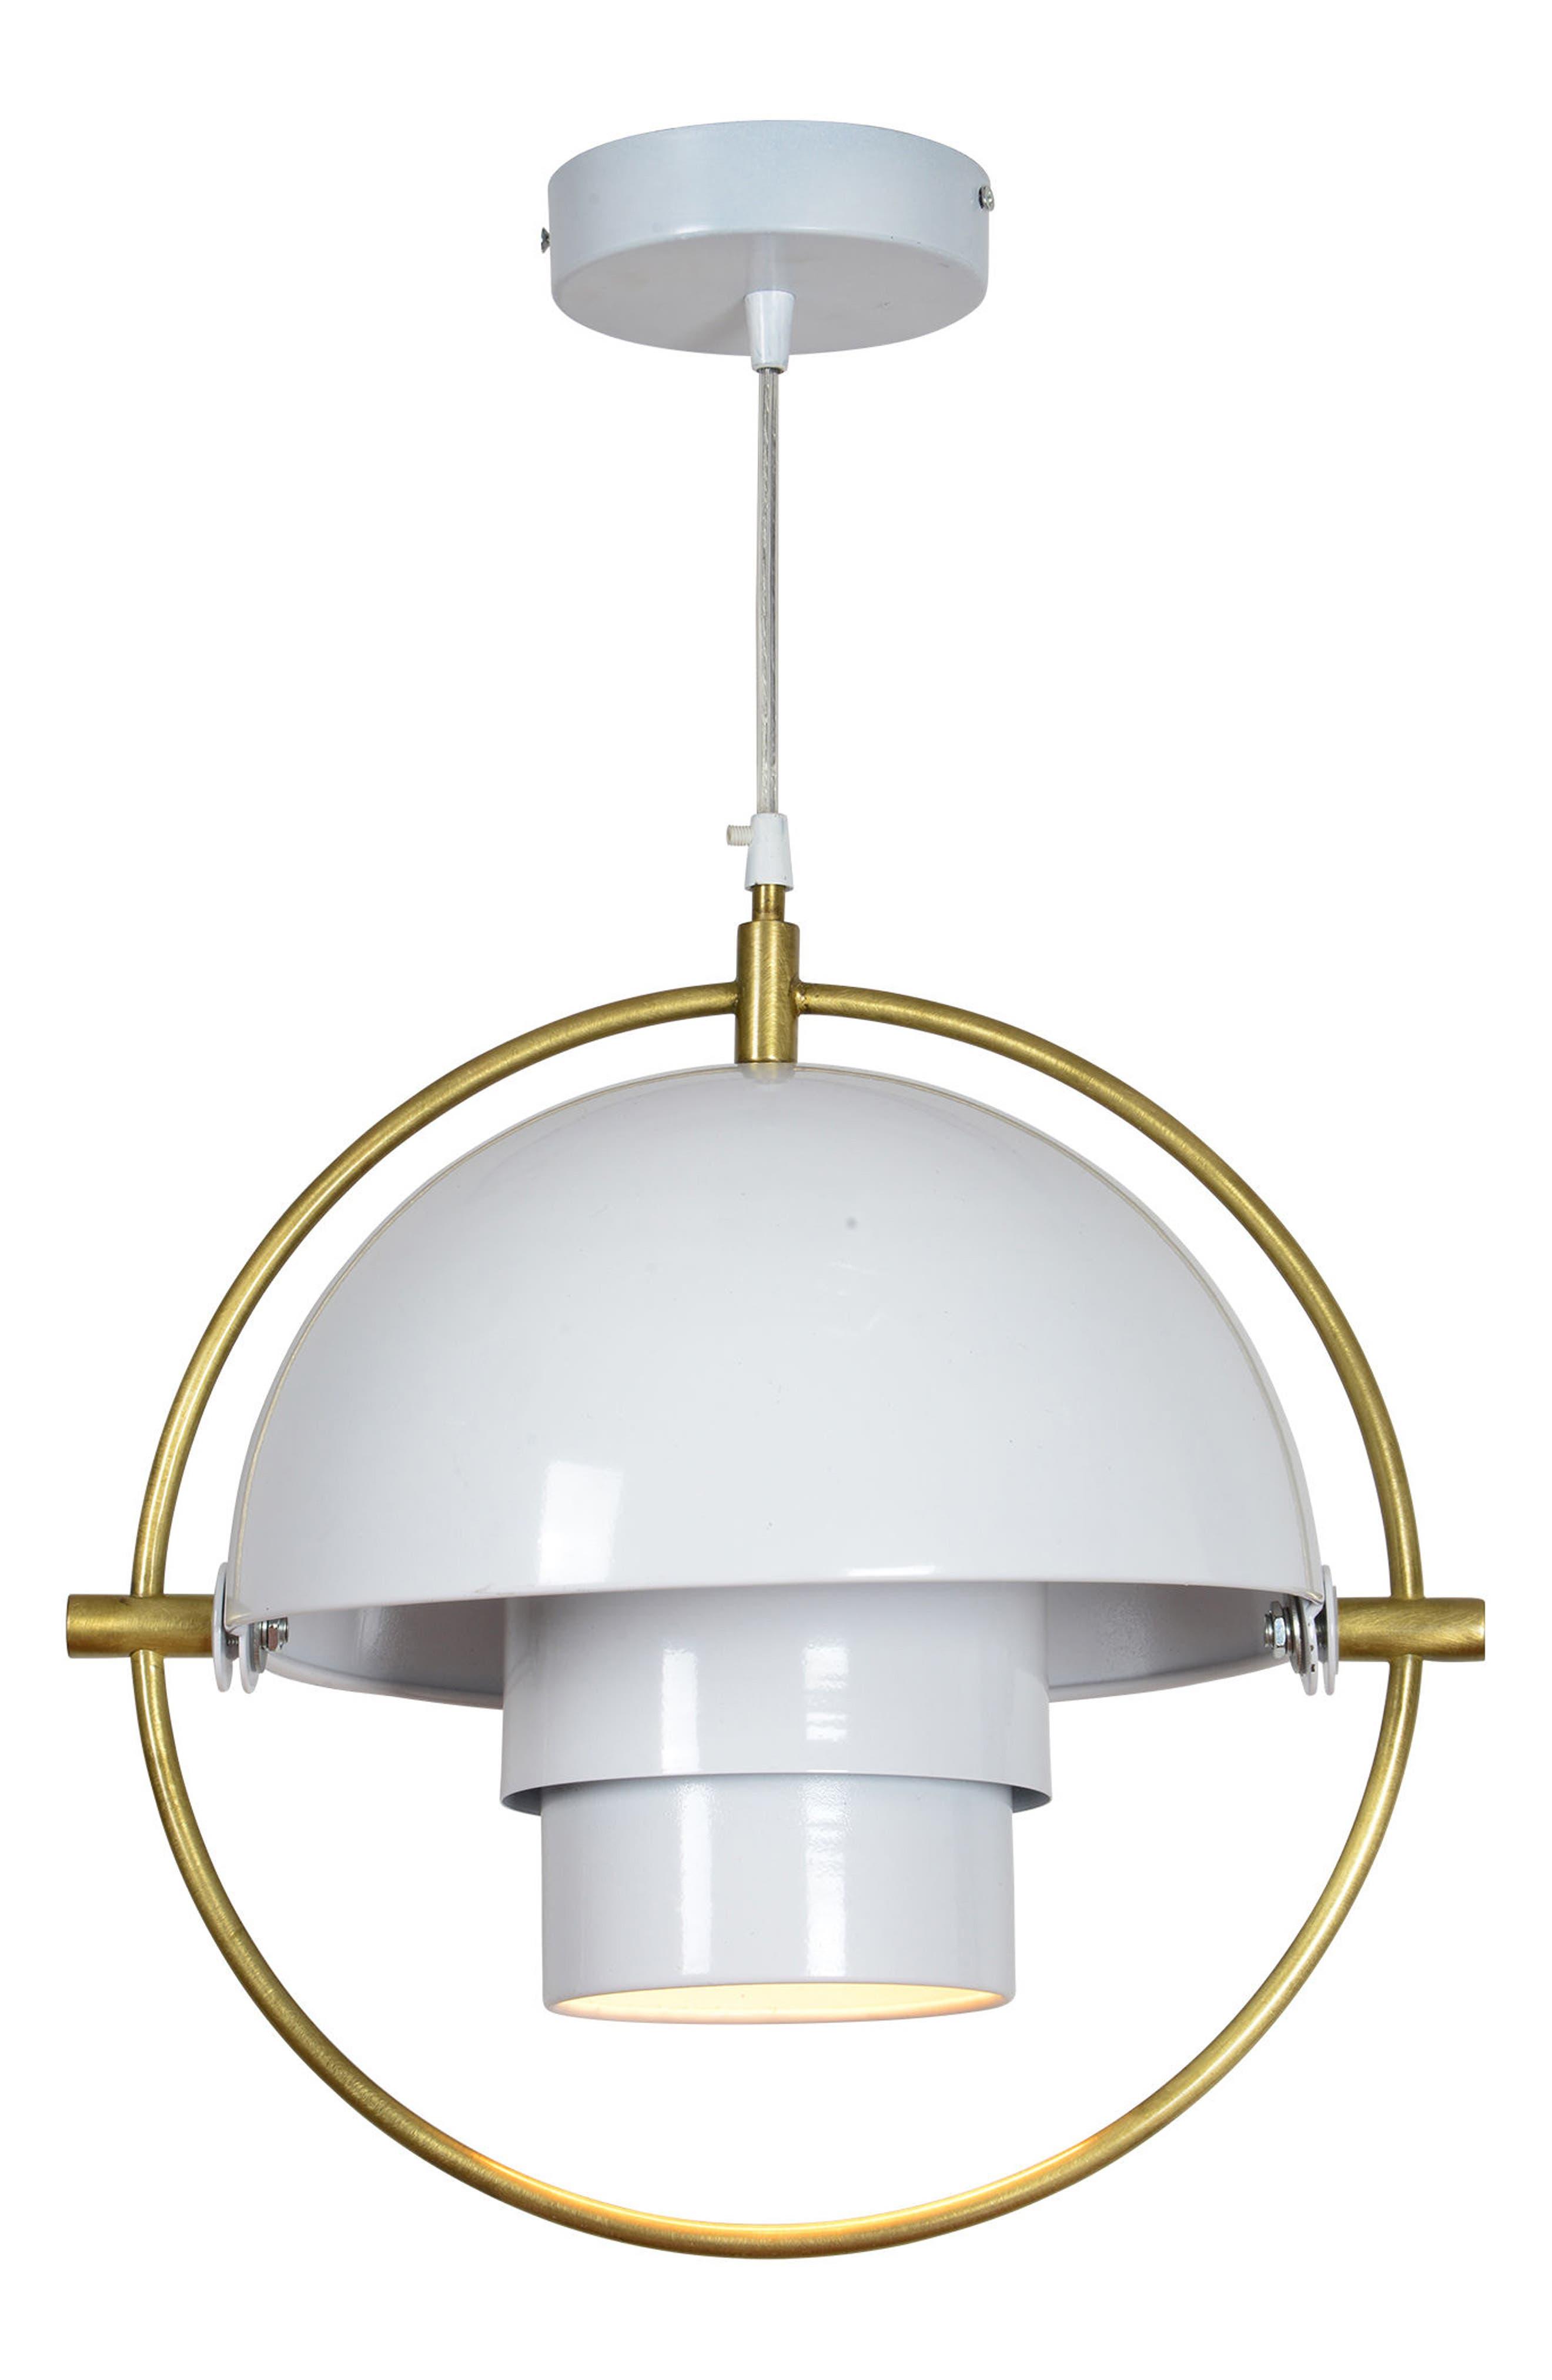 Main Image - Renwil Lantern Ceiling Light Fixture